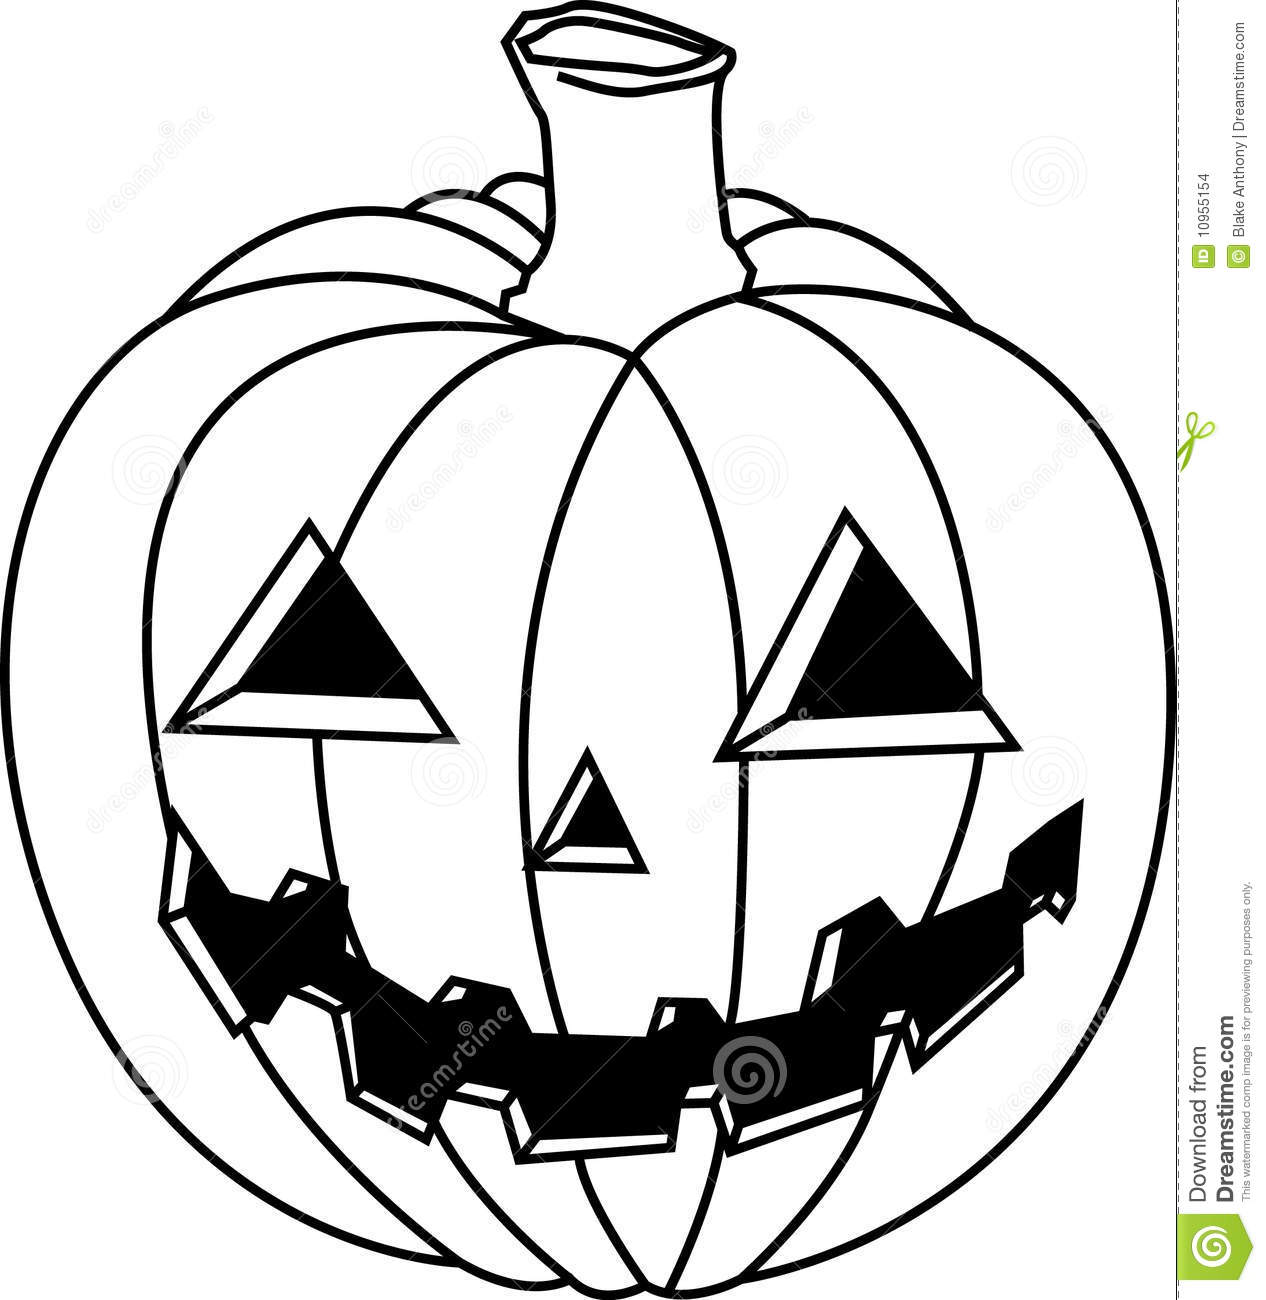 1266x1300 Black And White Jack O Lantern Clipart